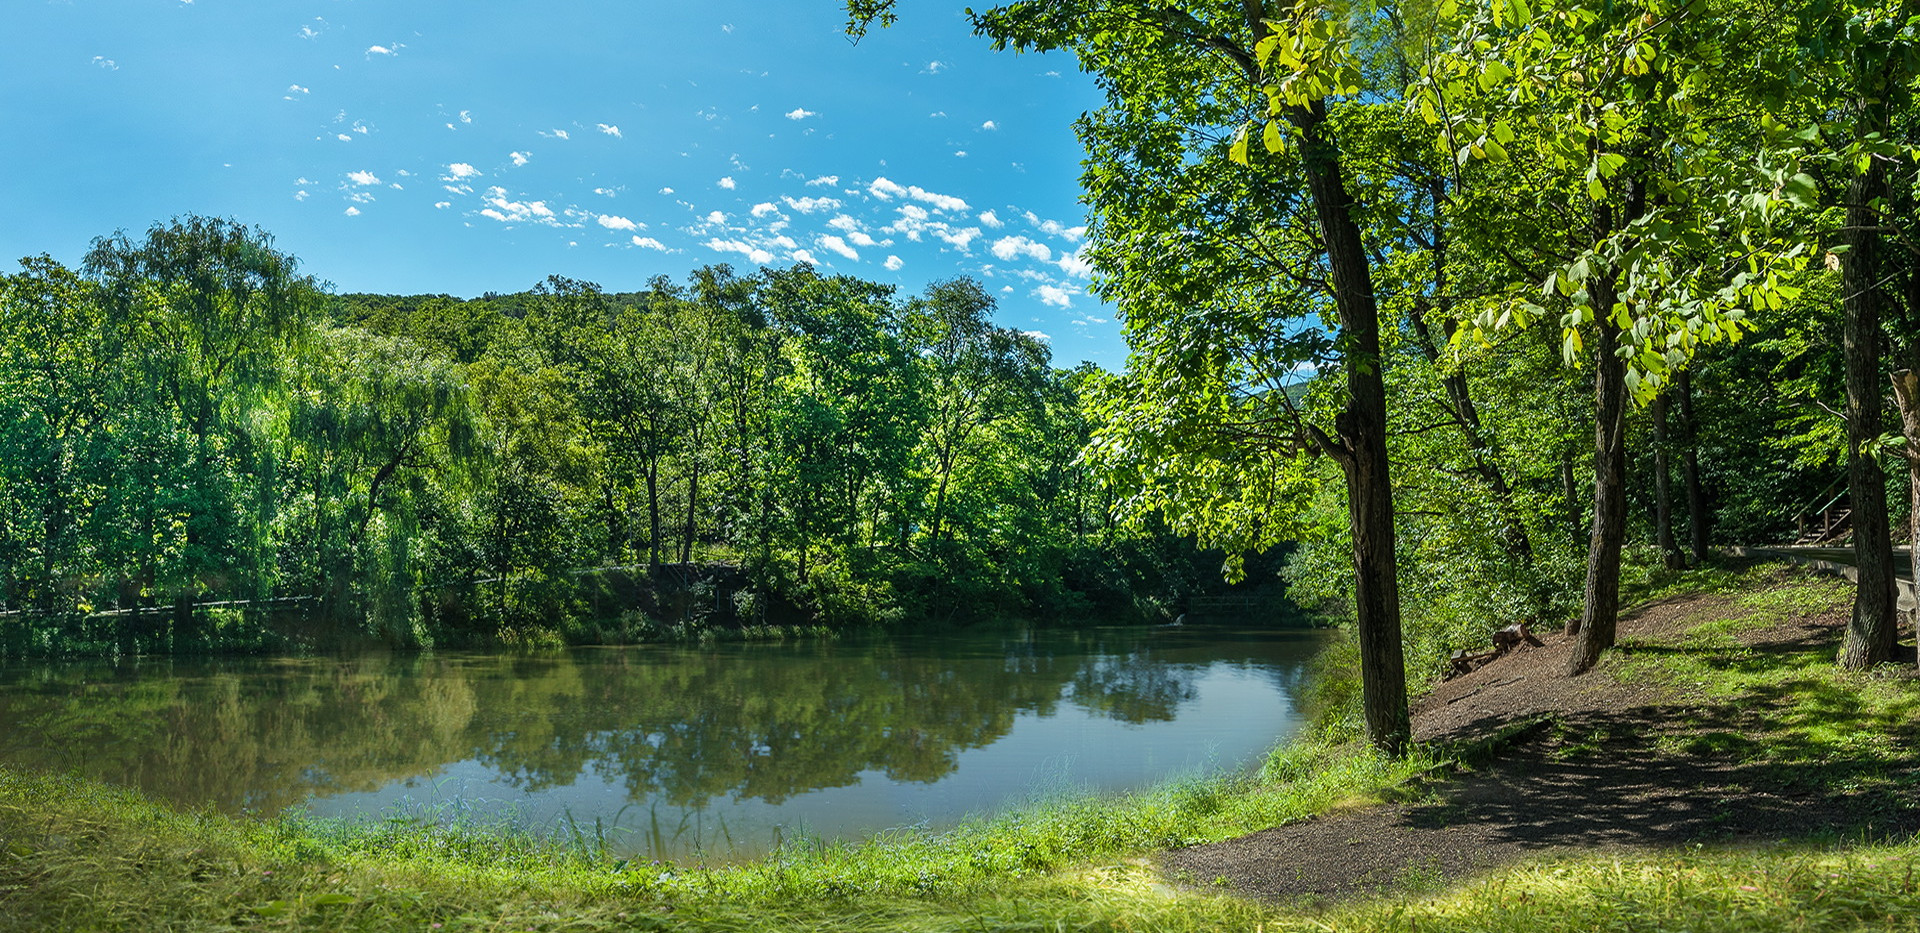 Парк Седанка. Озеро.jpg